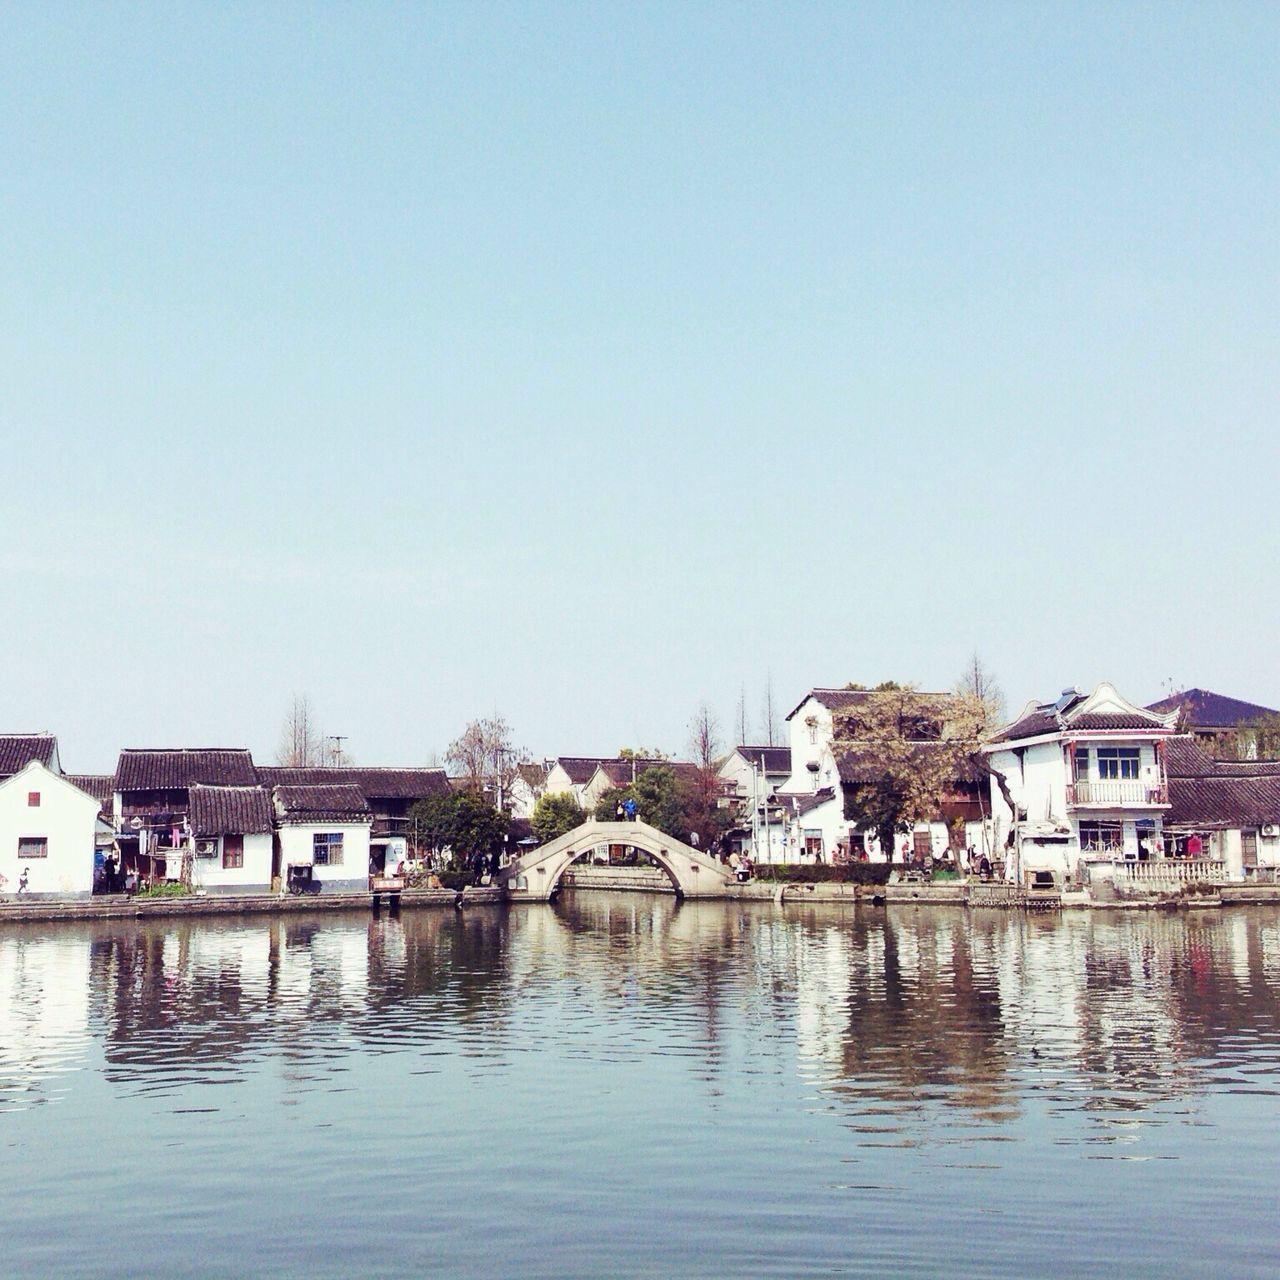 Water Built Structure Waterfront Clear Sky Tree Village Reflection Zhujiajiao Shanghai China